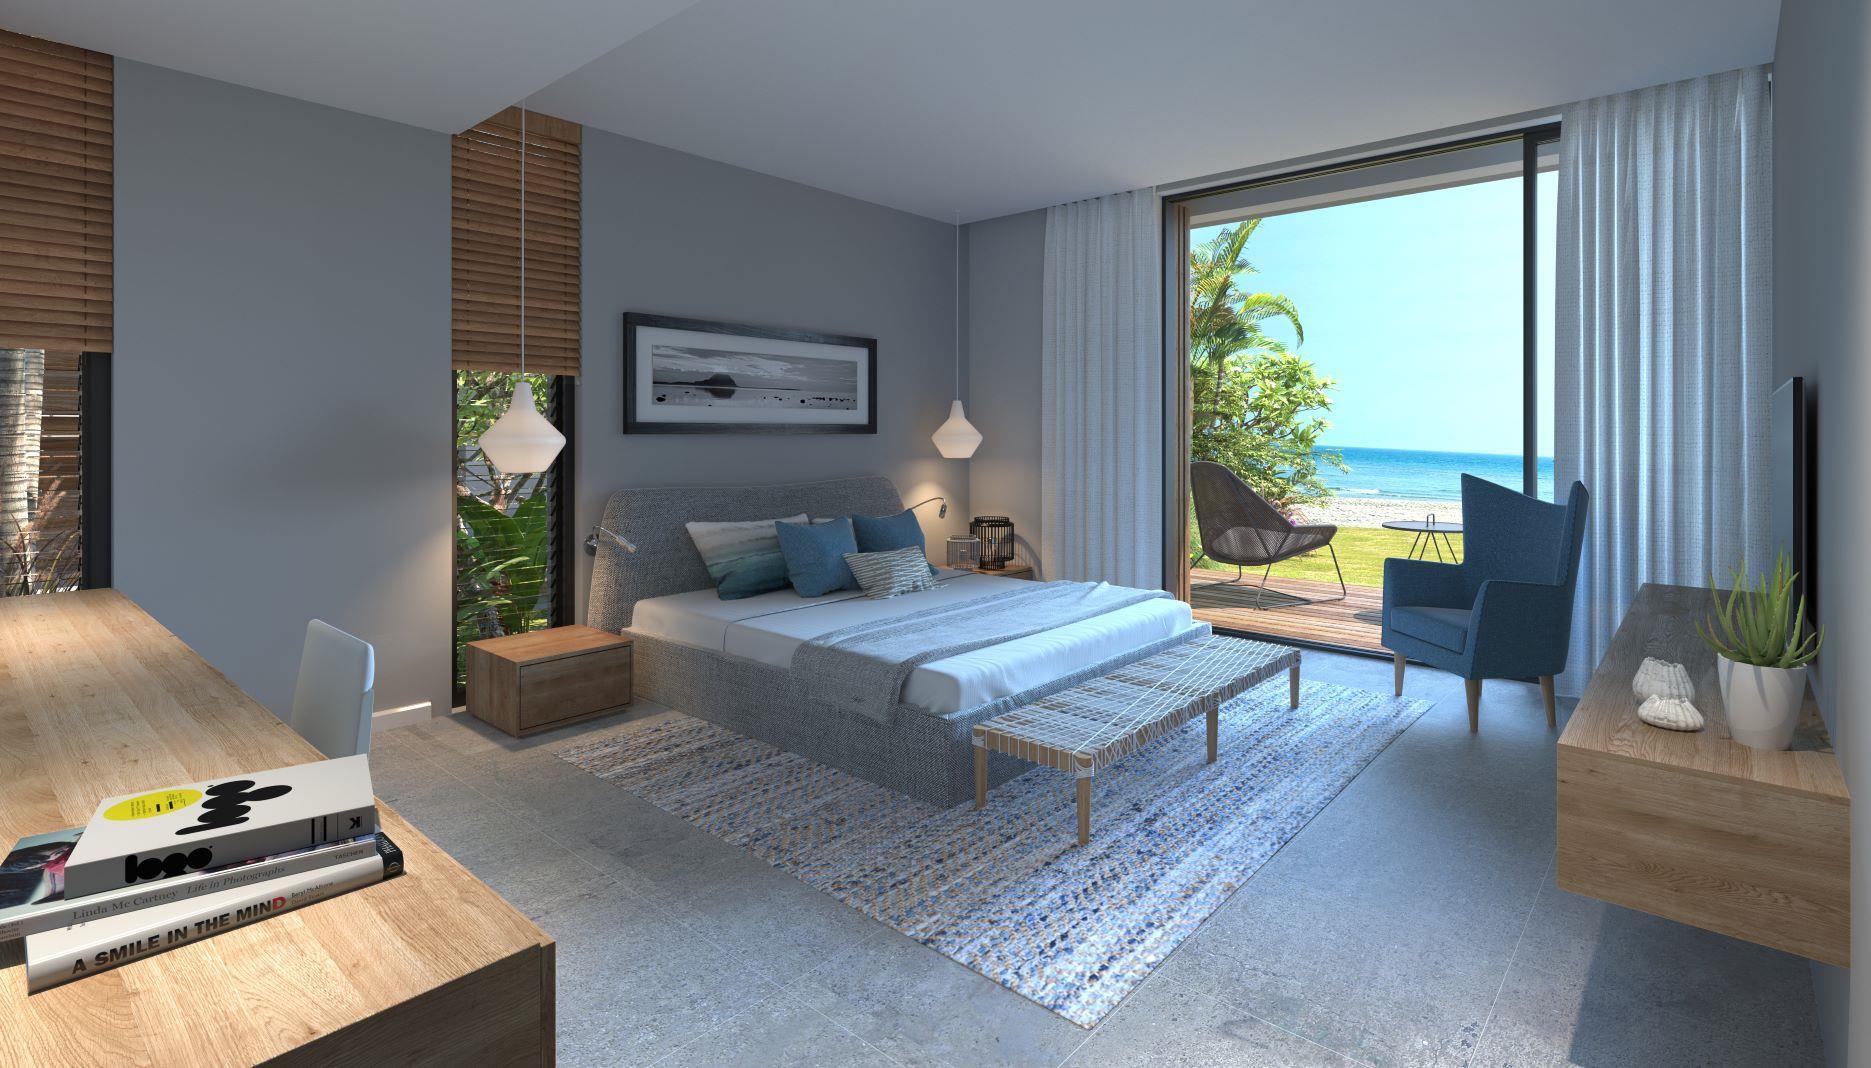 3 Bedroom House For Sale in Grande Rivière Noire